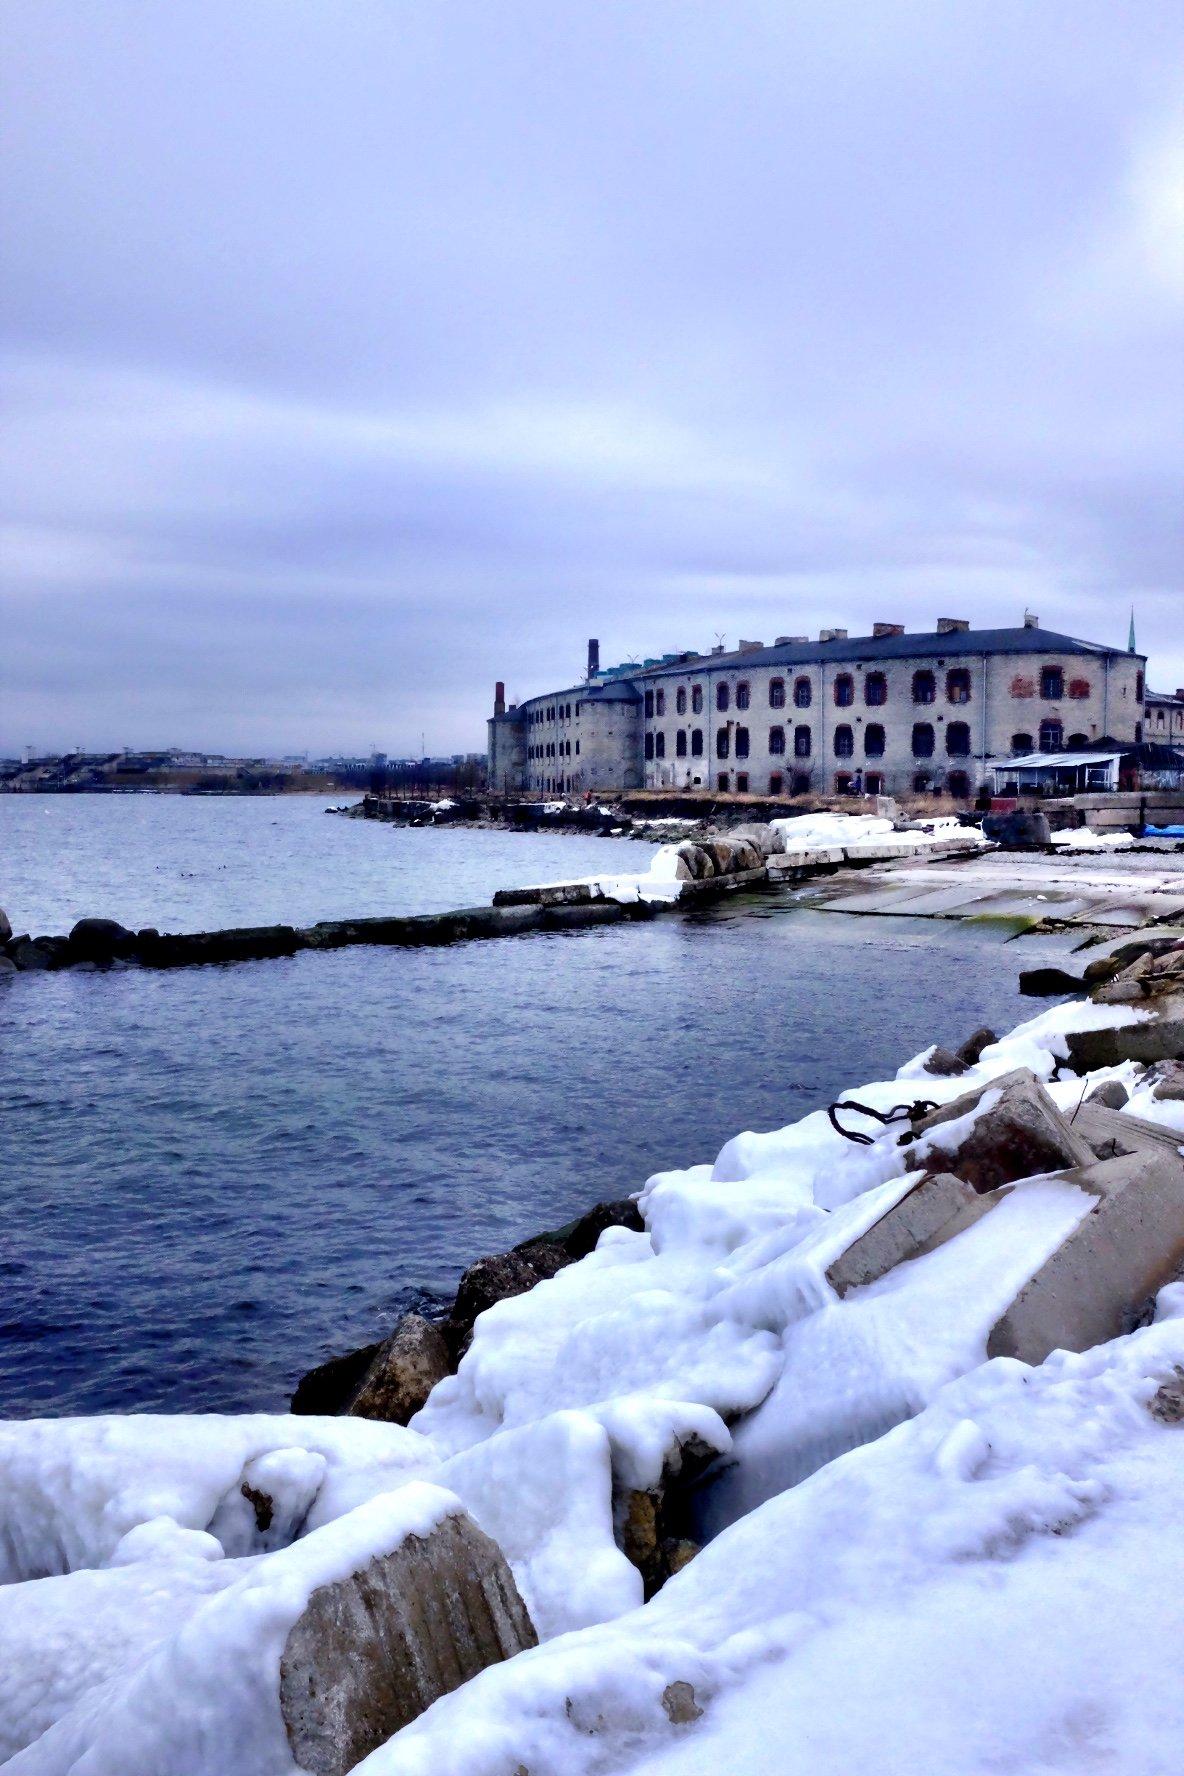 Snowy Coast at the Seaplane Museum in Tallinn